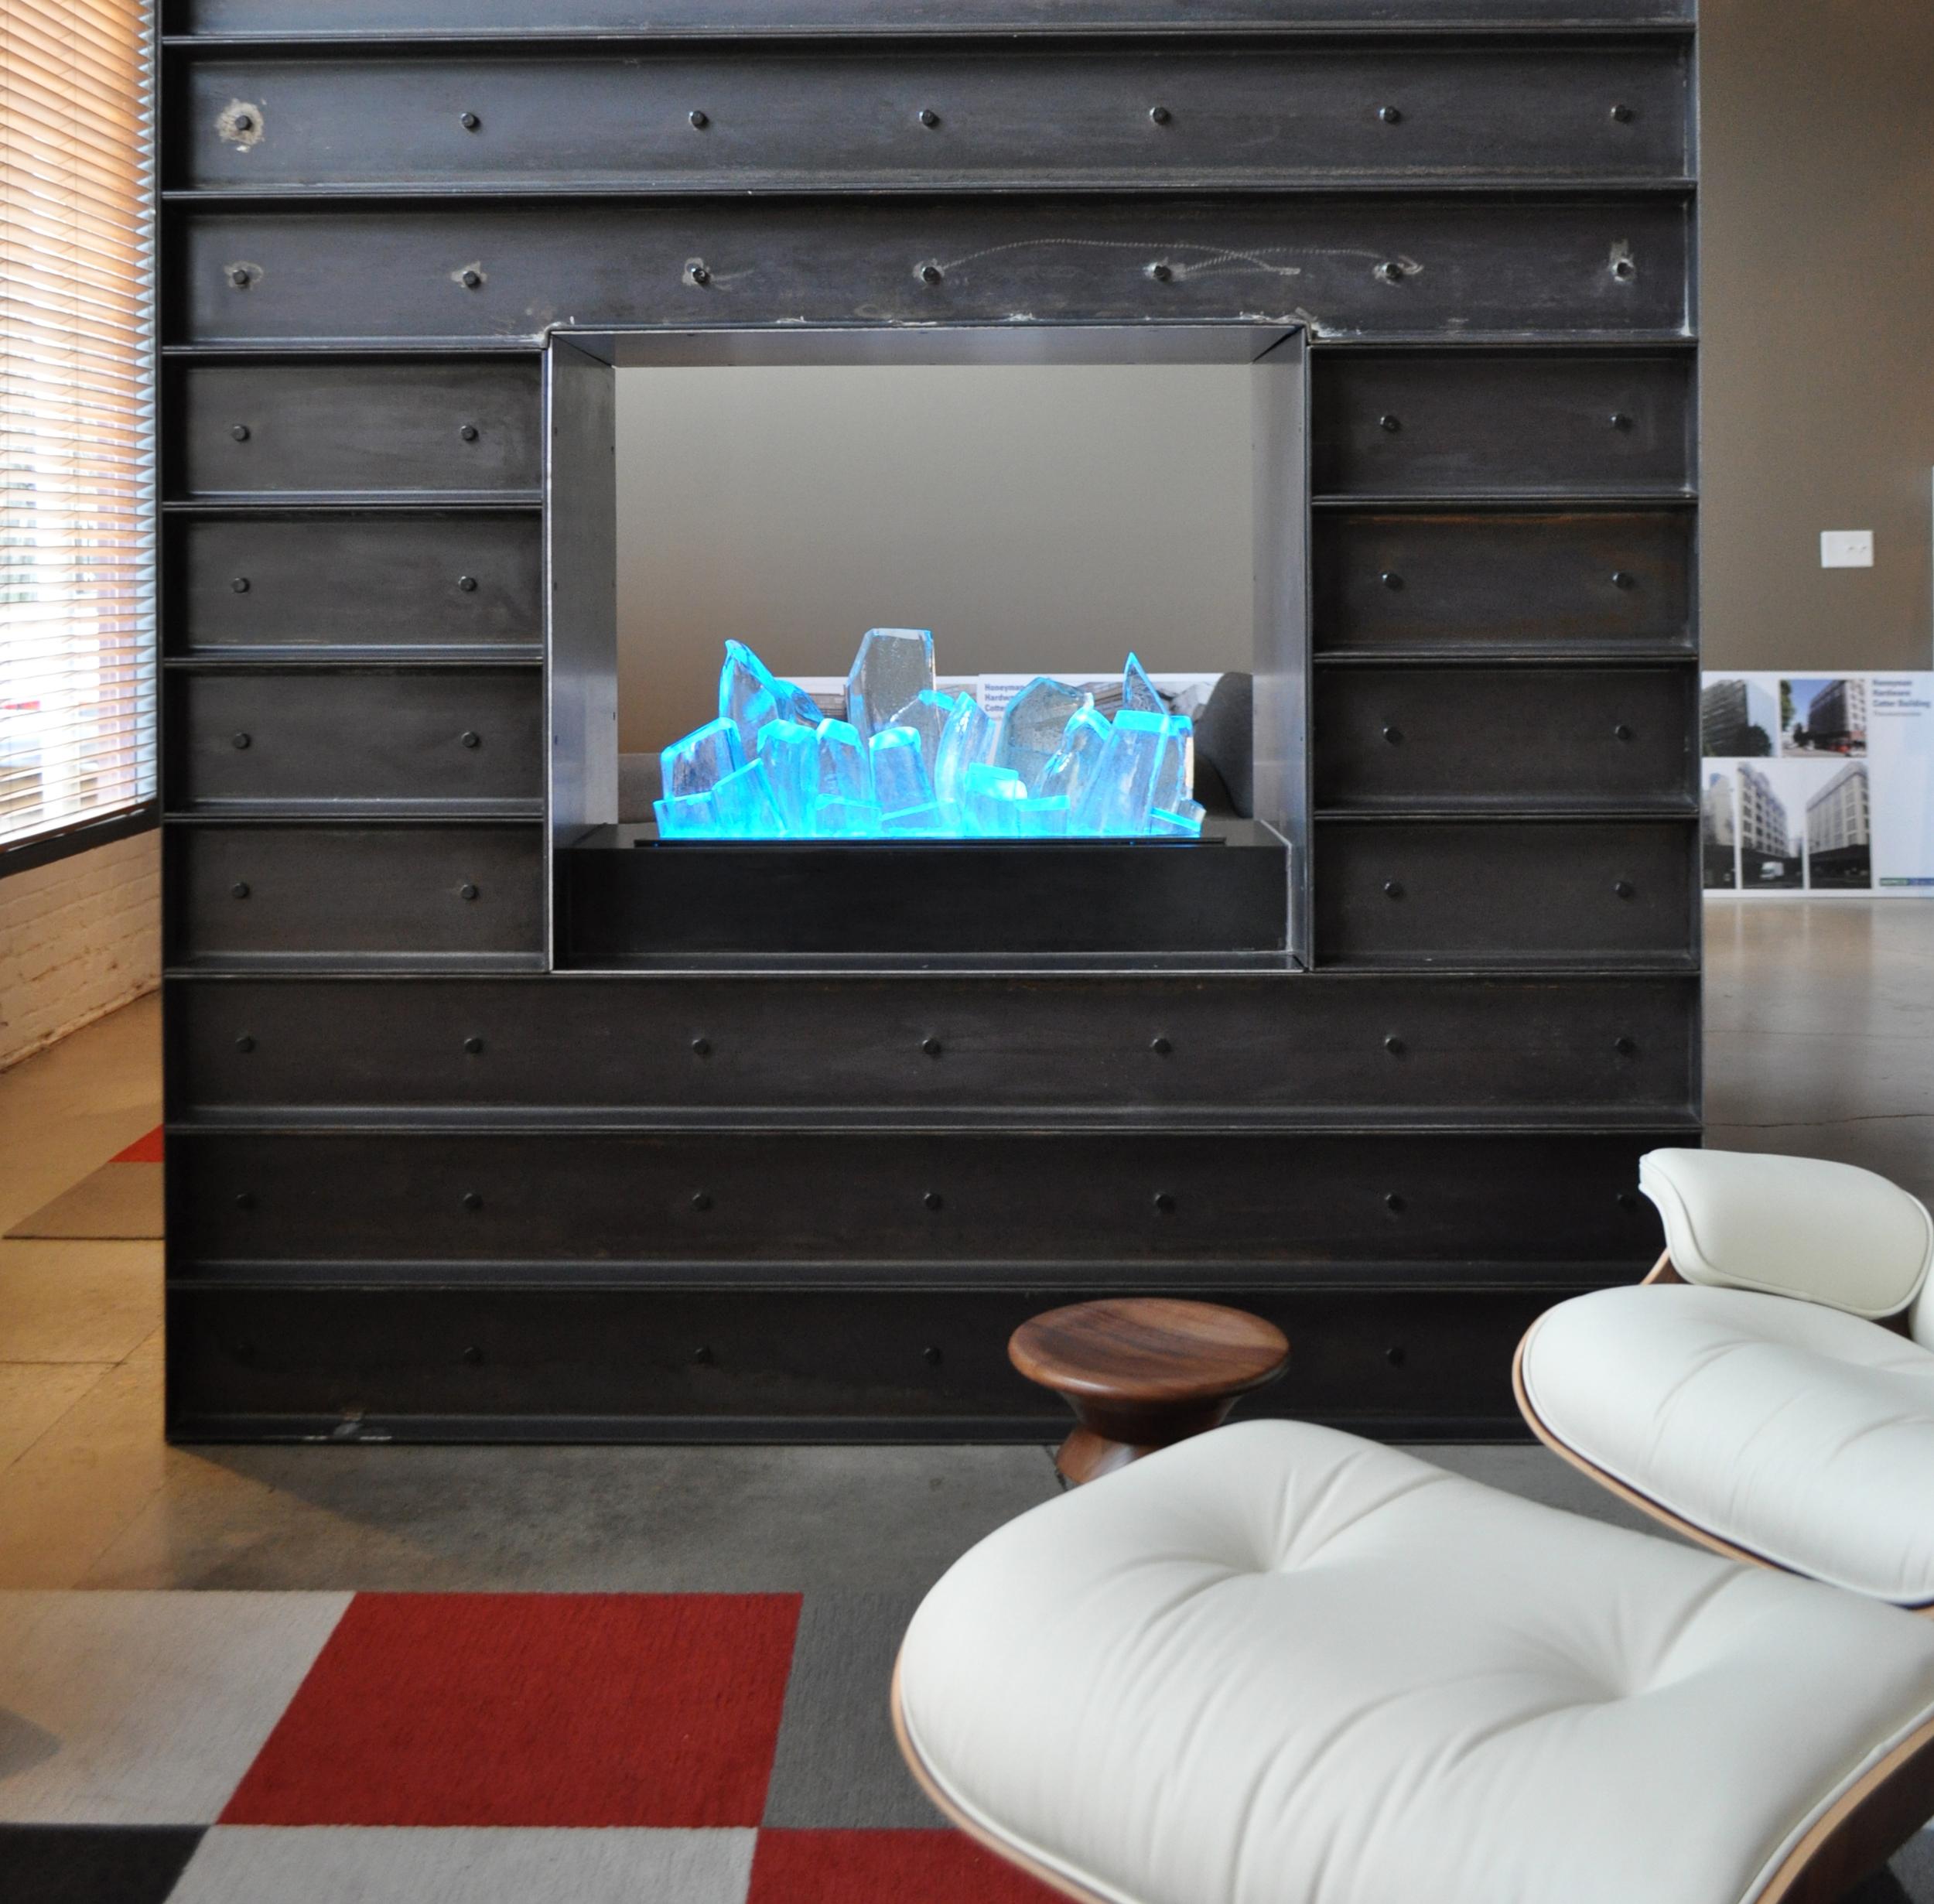 alight-fireplace-insert.jpg